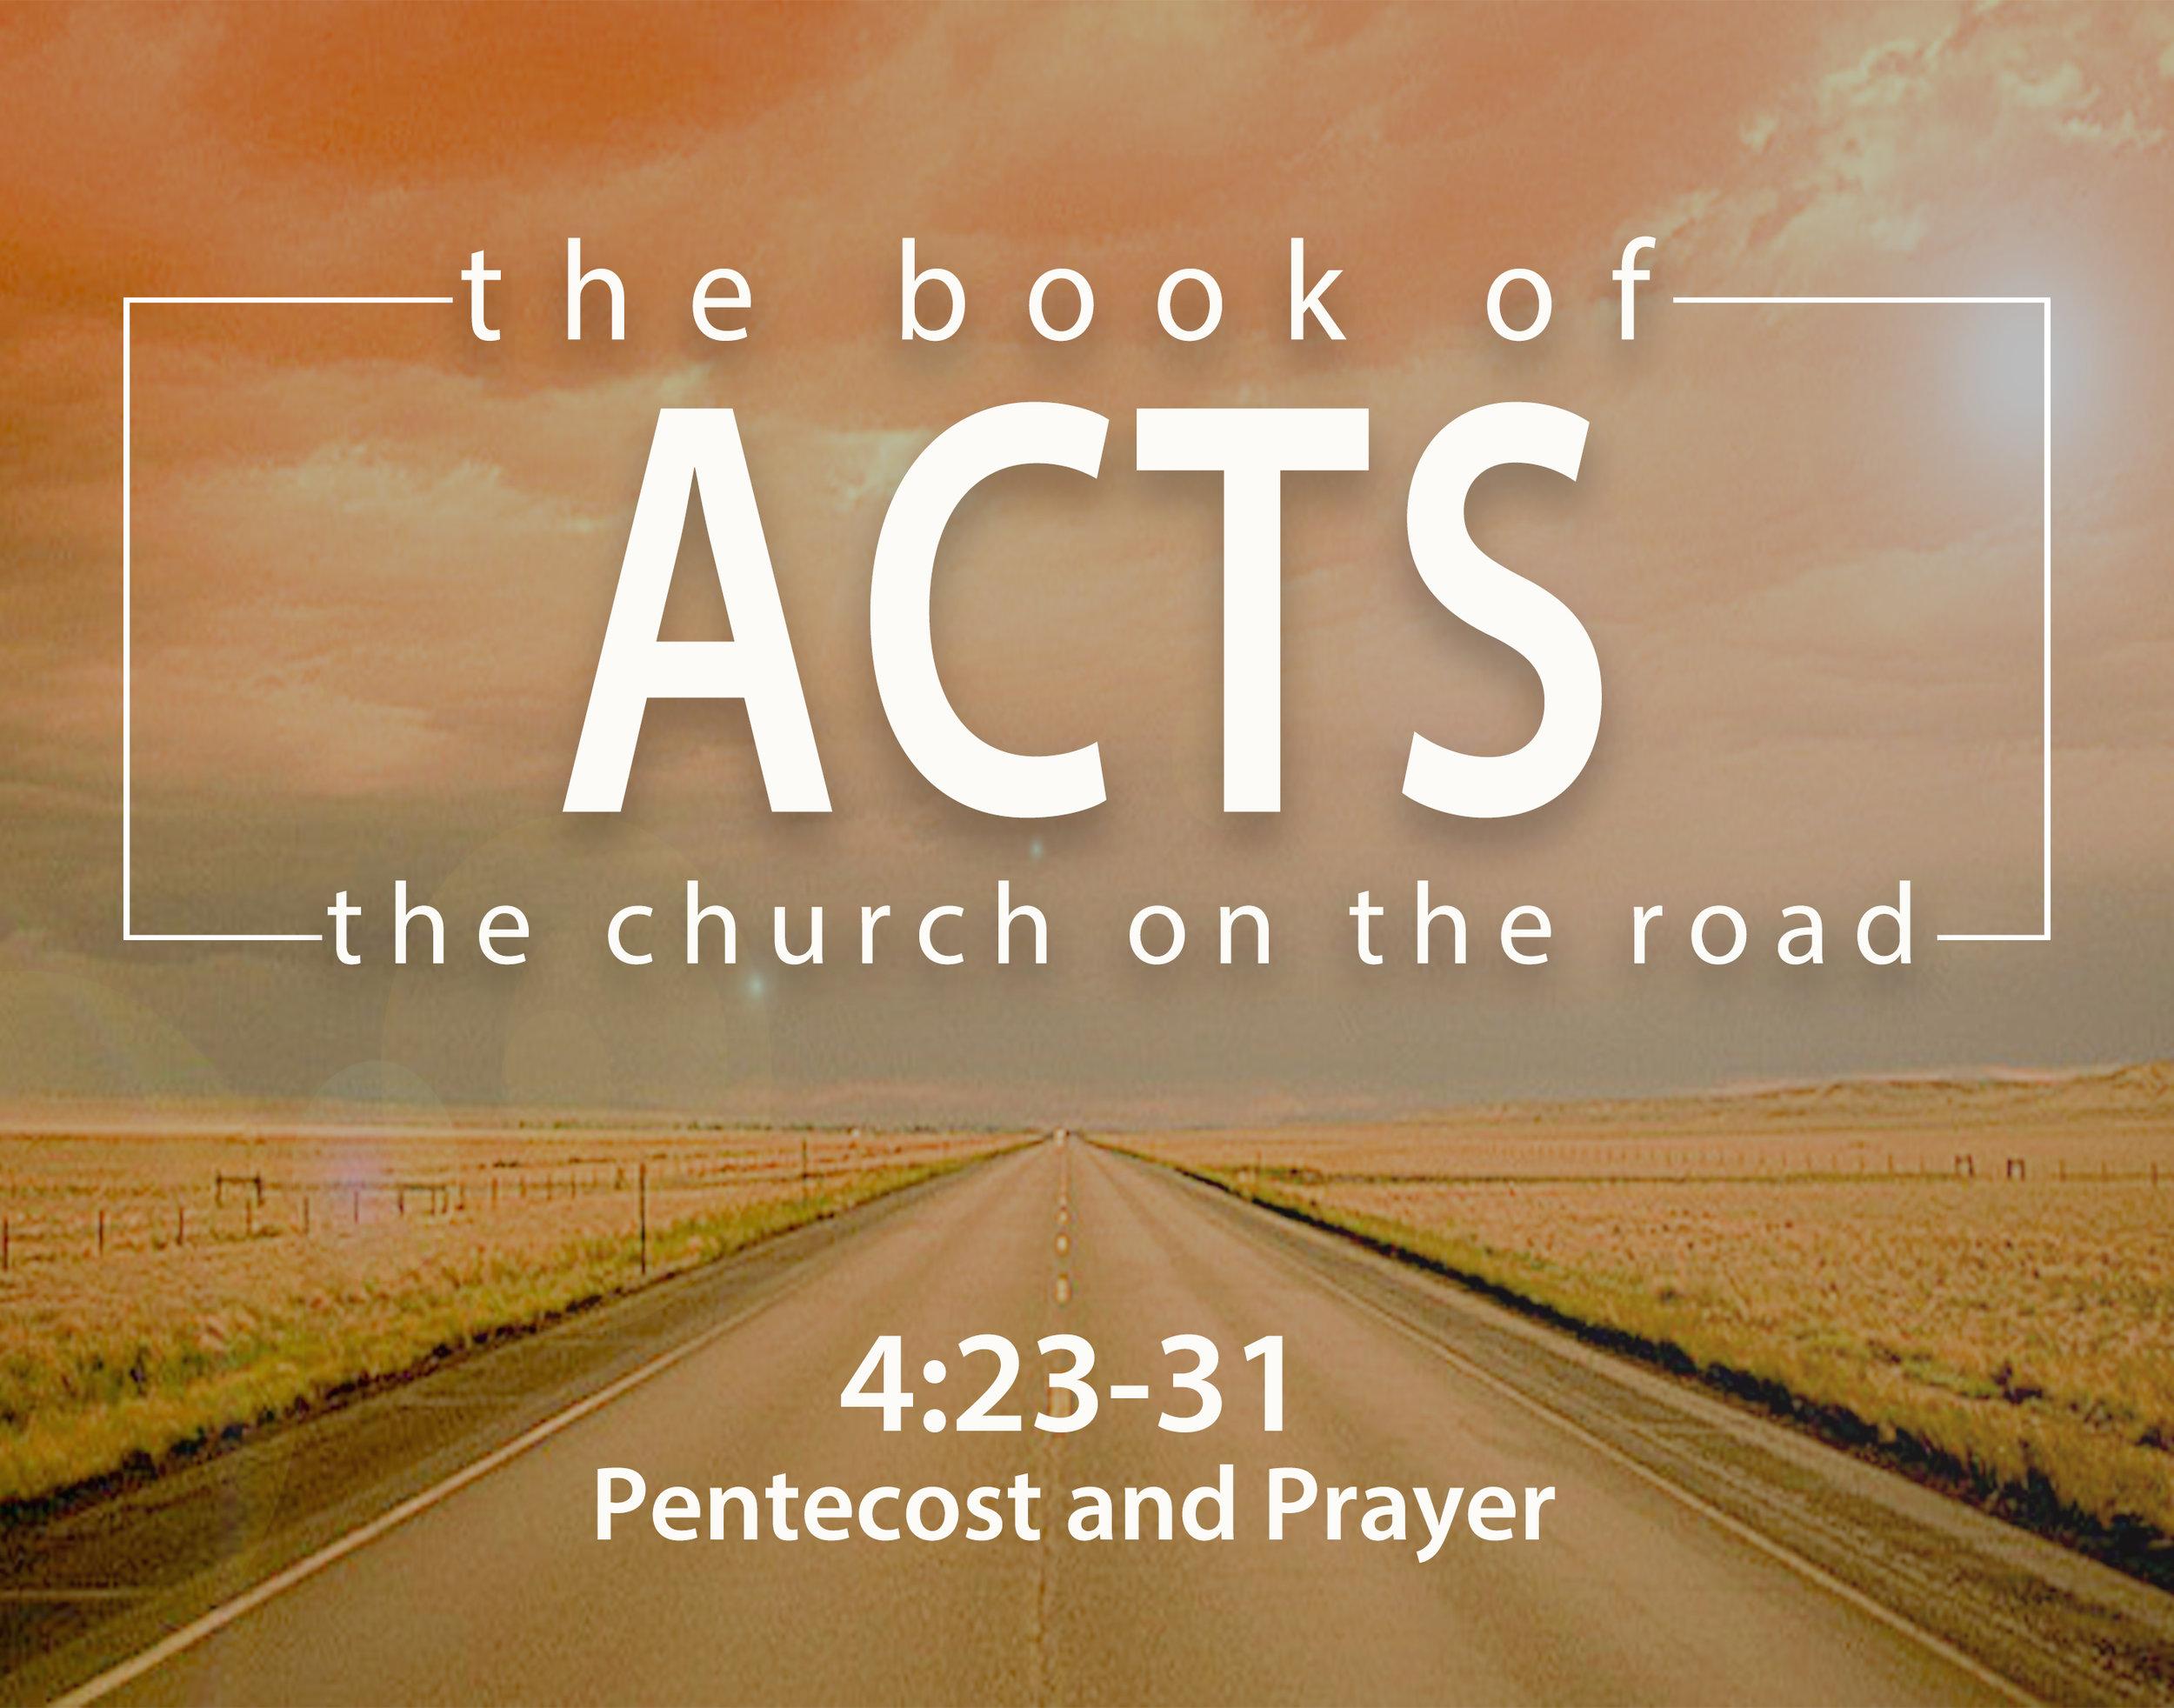 07Pentecost and Prayer.jpg